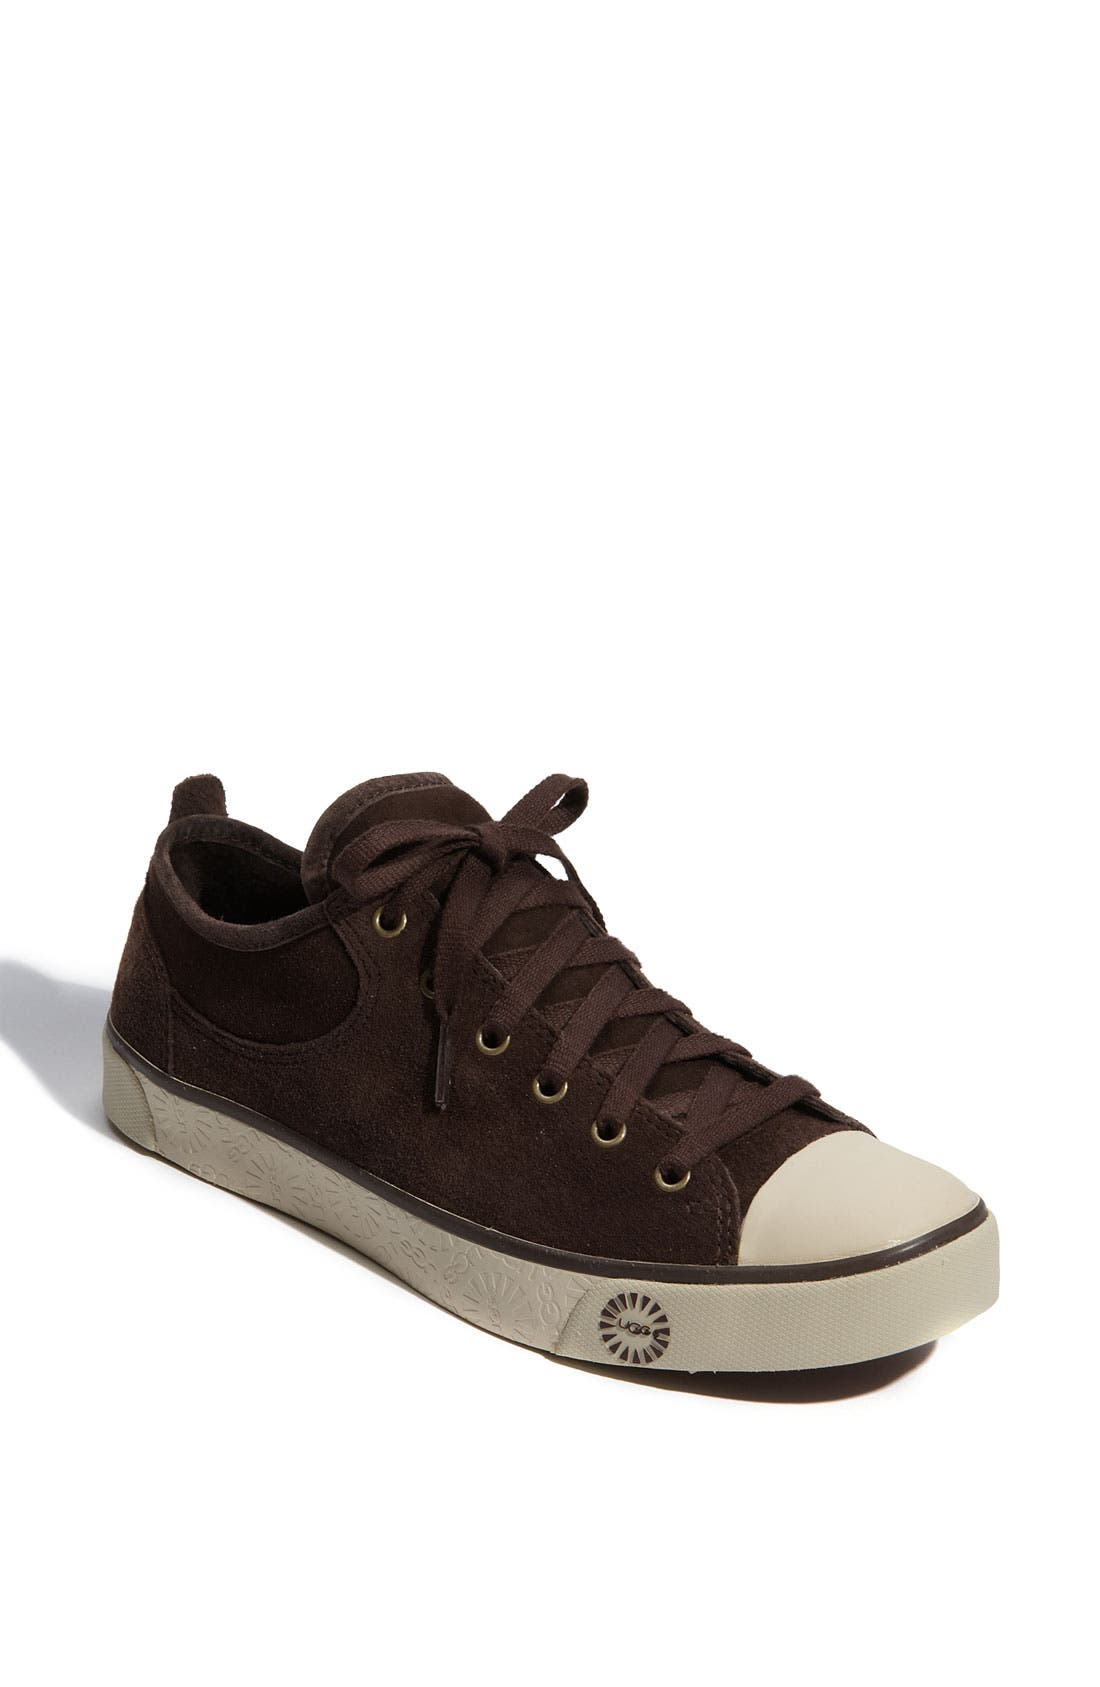 Main Image - UGG® Australia 'Evera' Suede Sneaker (Women)